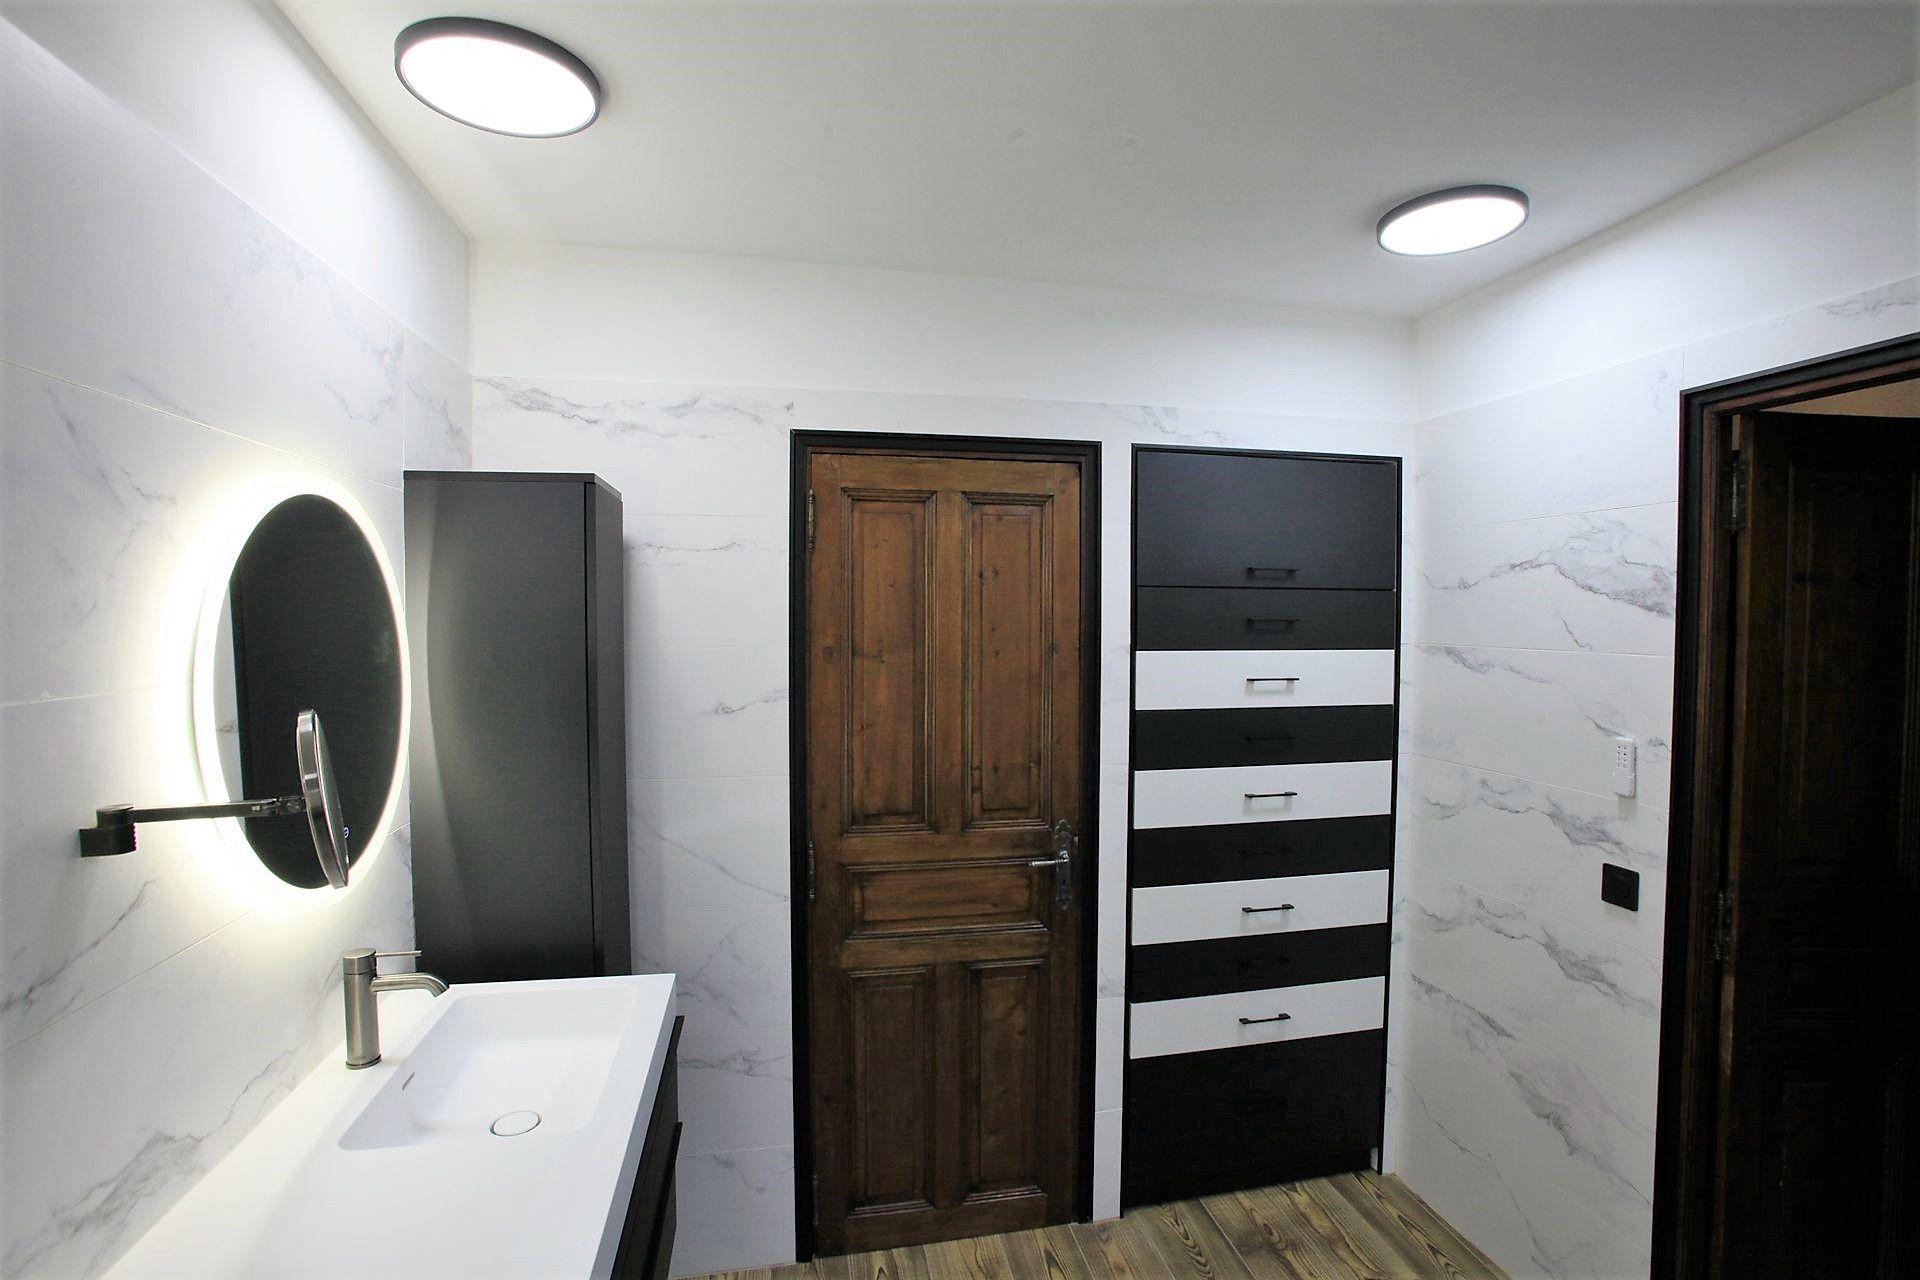 meuble-sur-mesure-salle-bain